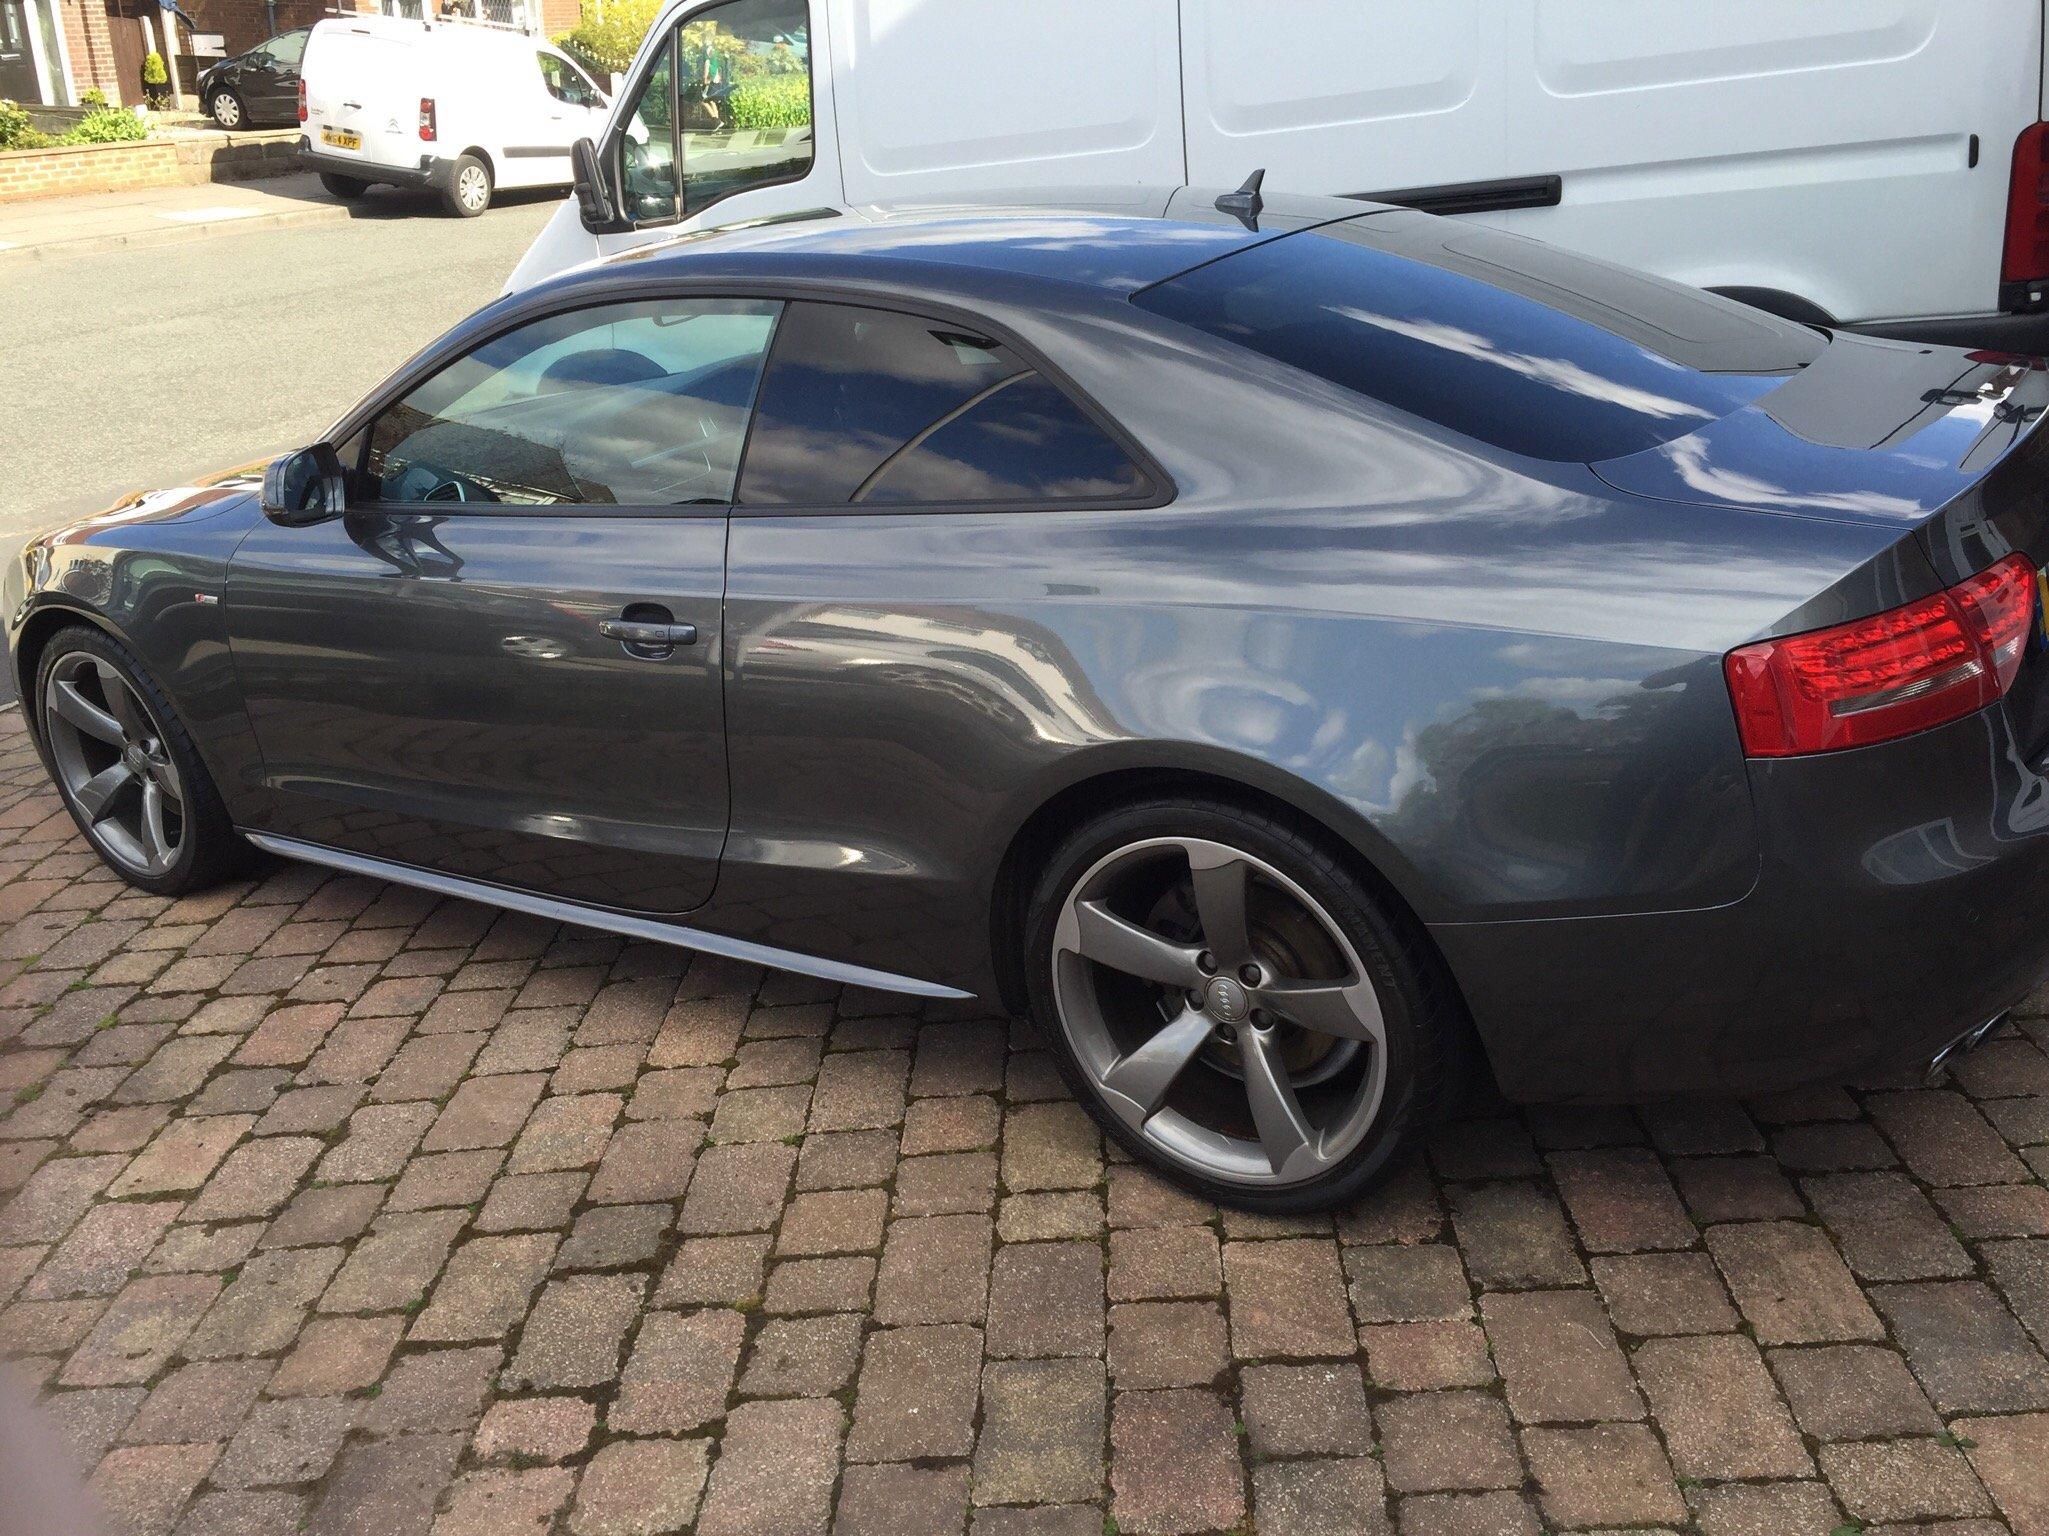 New car, new toy, MMI update, hacks etc    | Audi A5 Forum & Audi S5